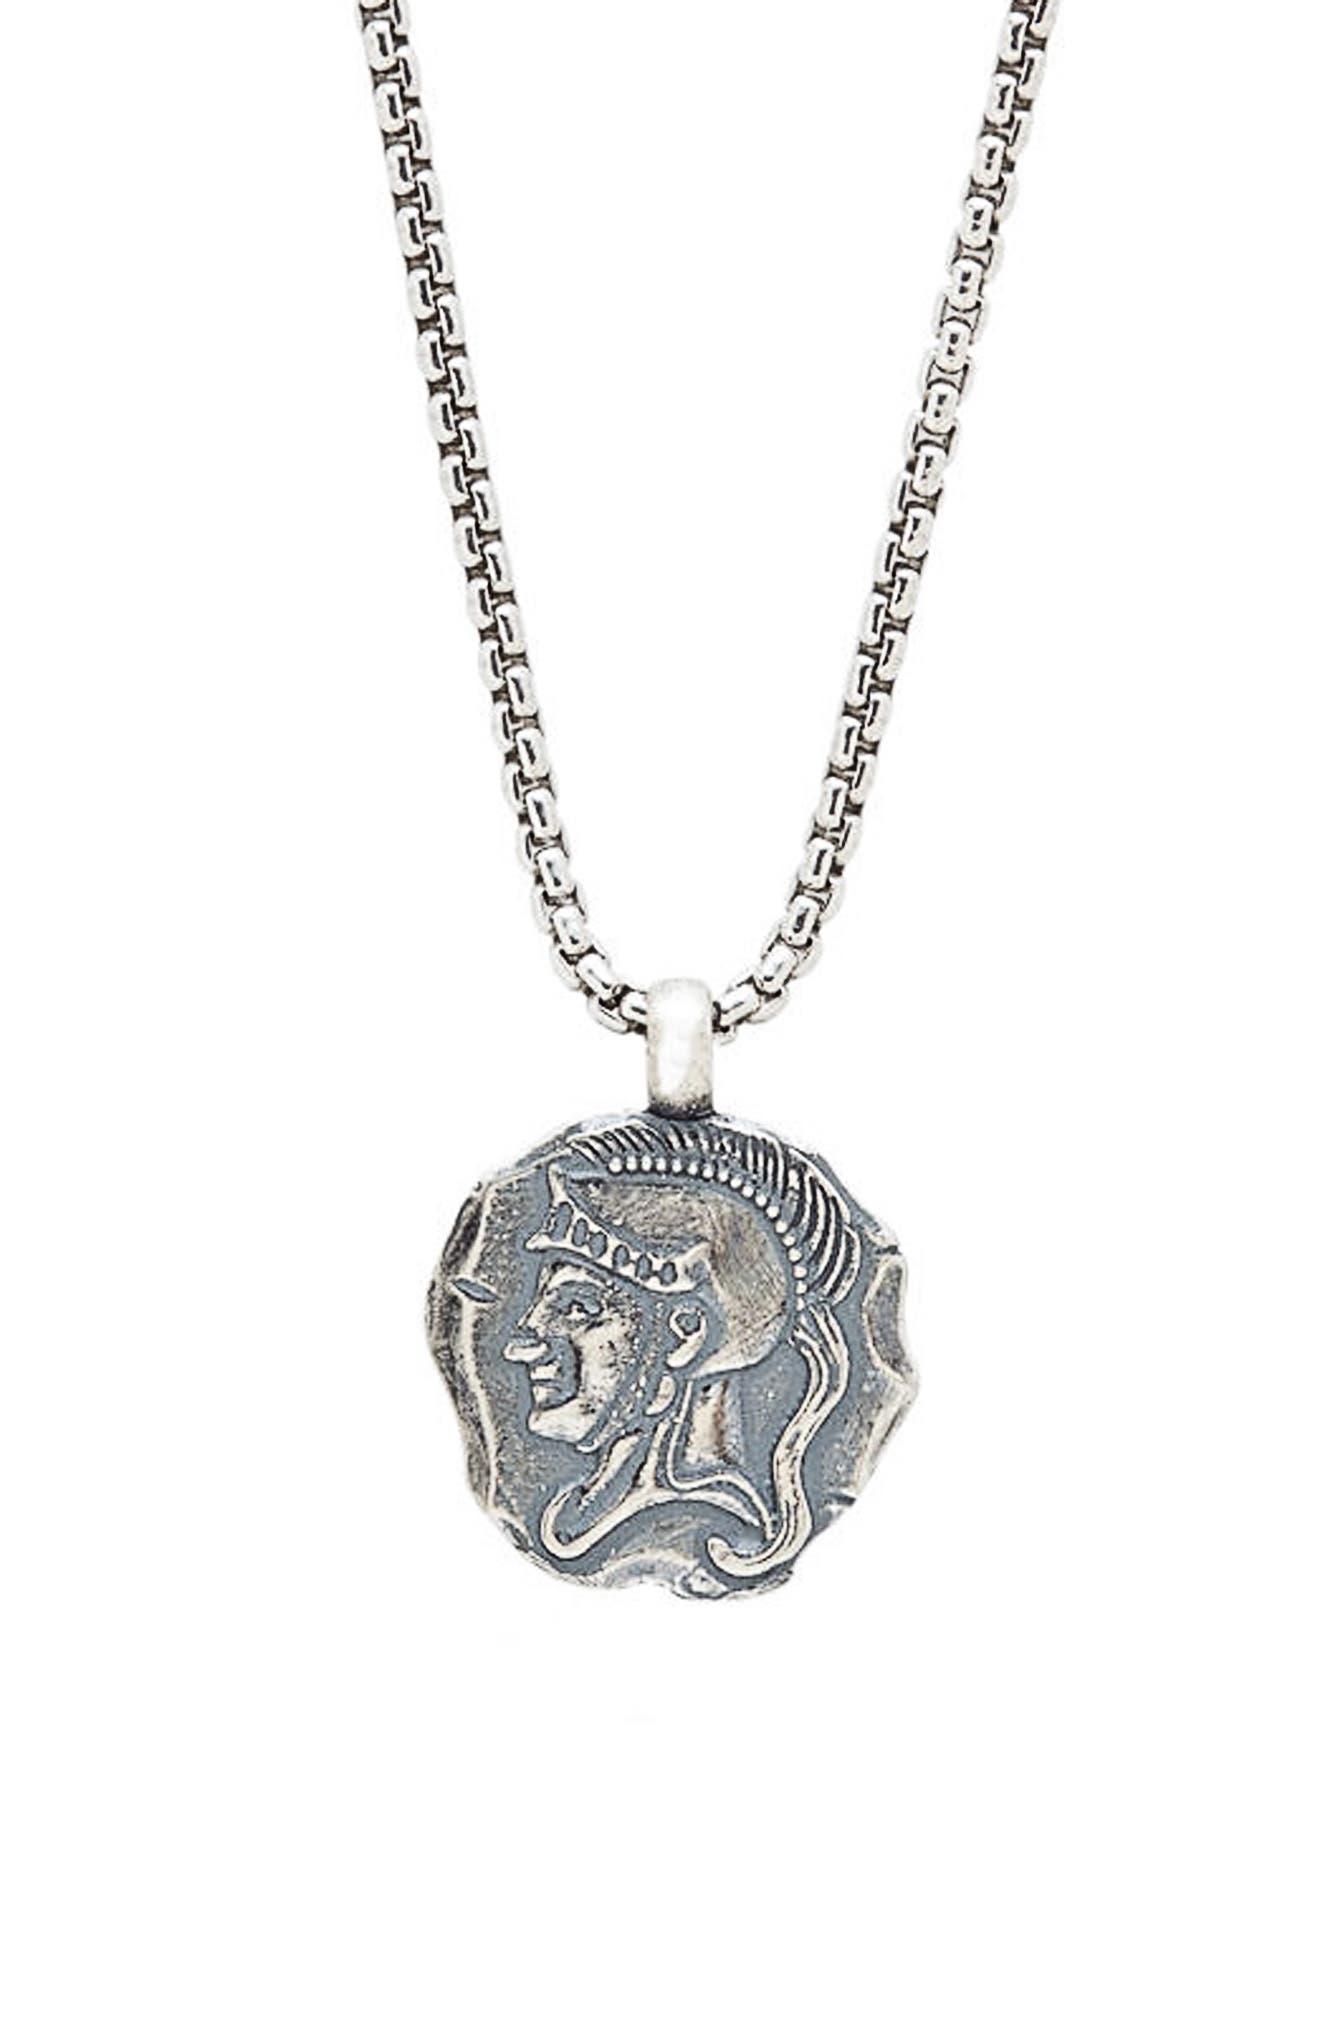 Spartan Pendant Necklace